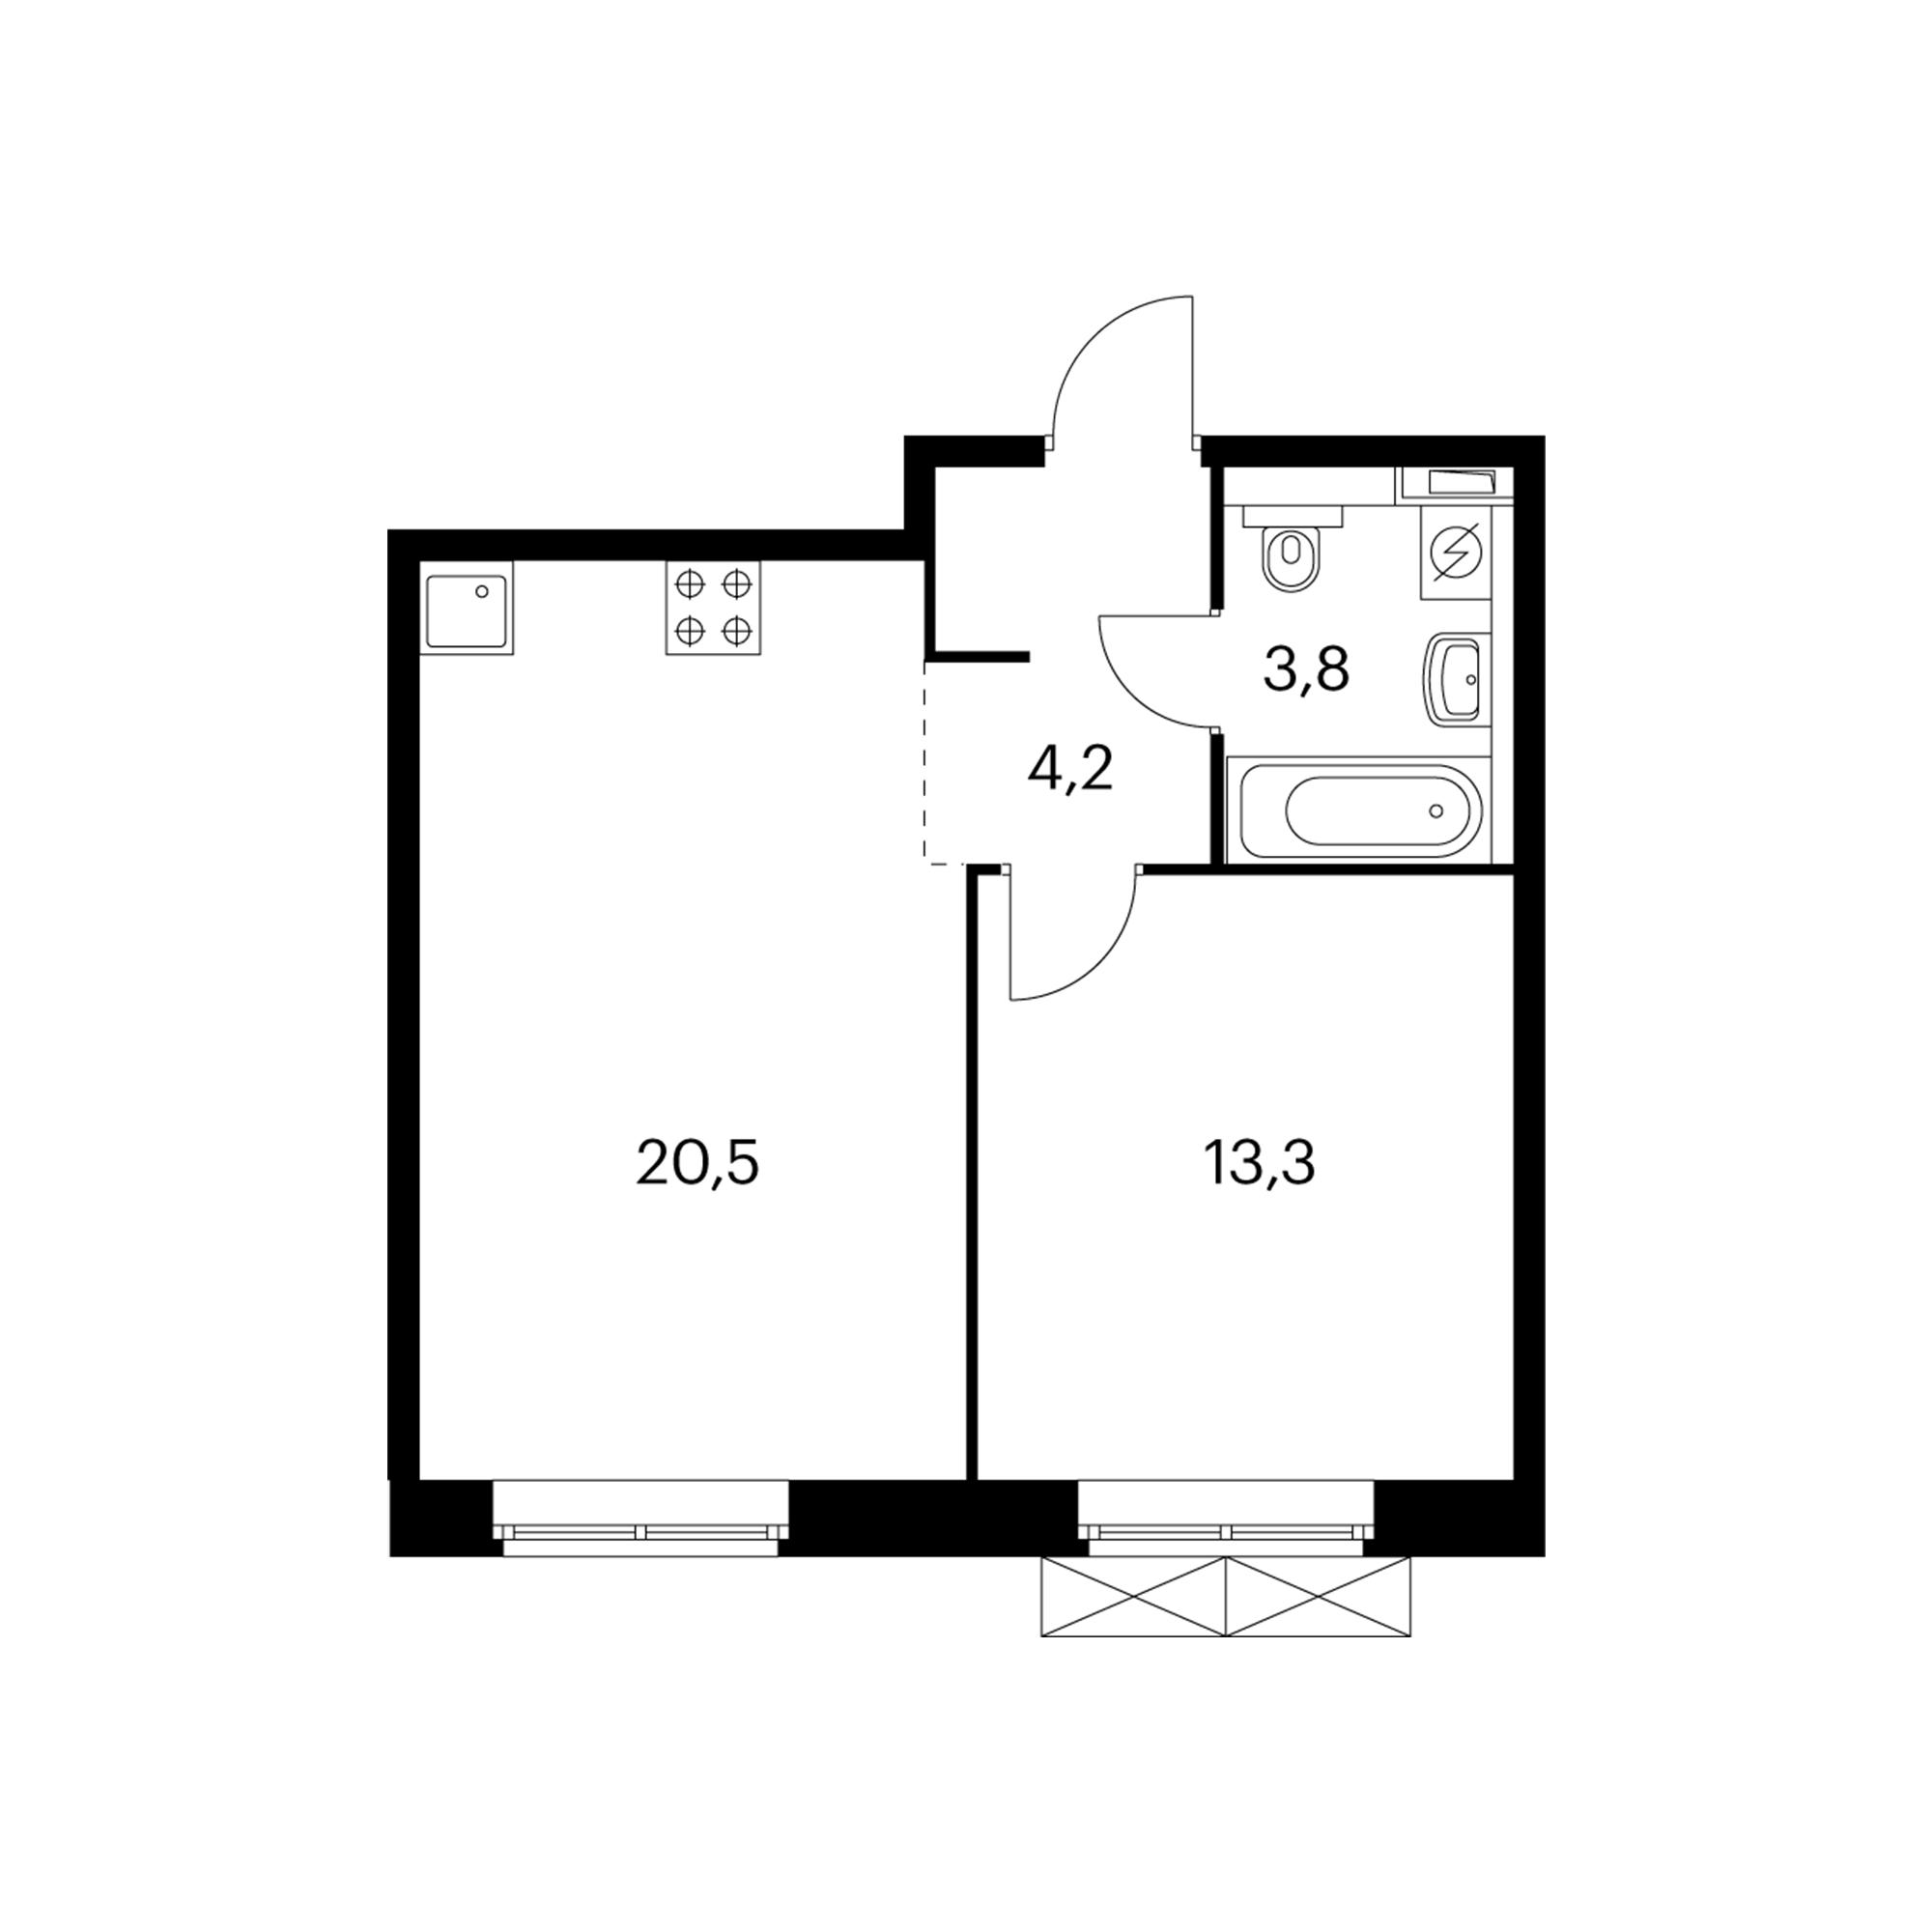 1EL3_7.2-4